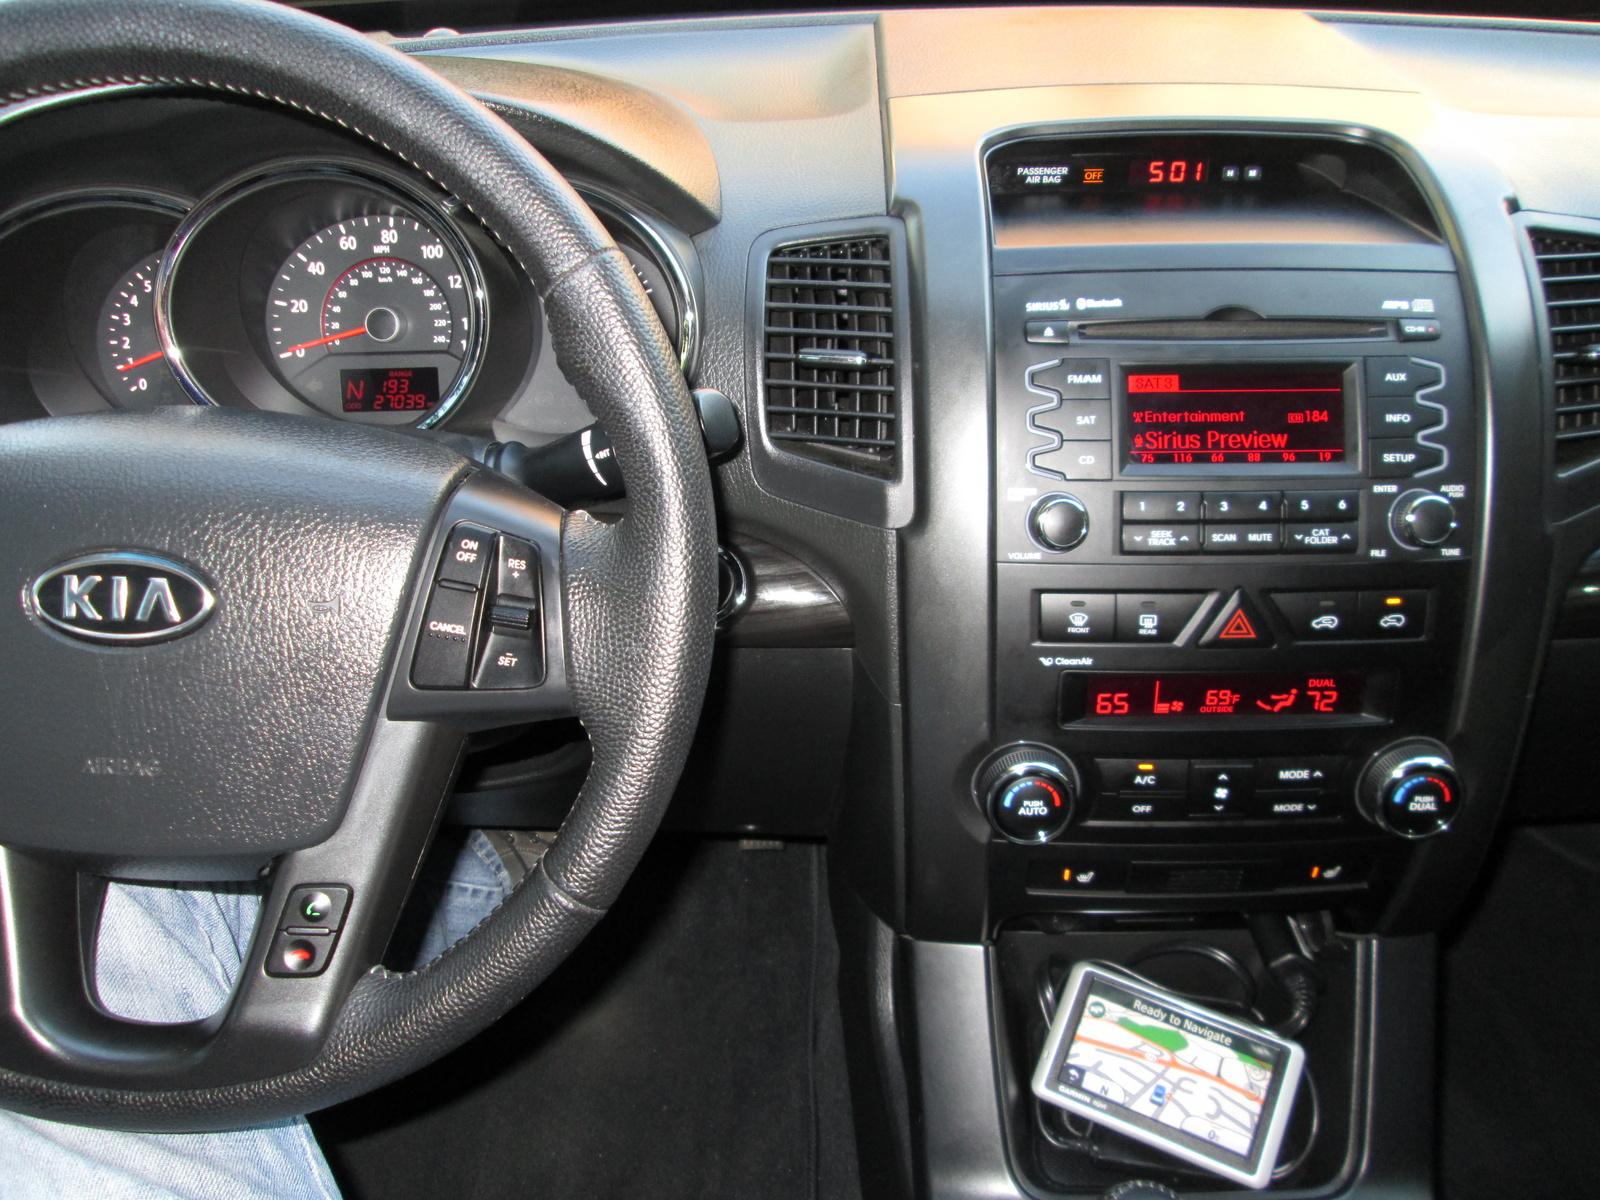 2011 Kia Sorento Interior Pictures Cargurus